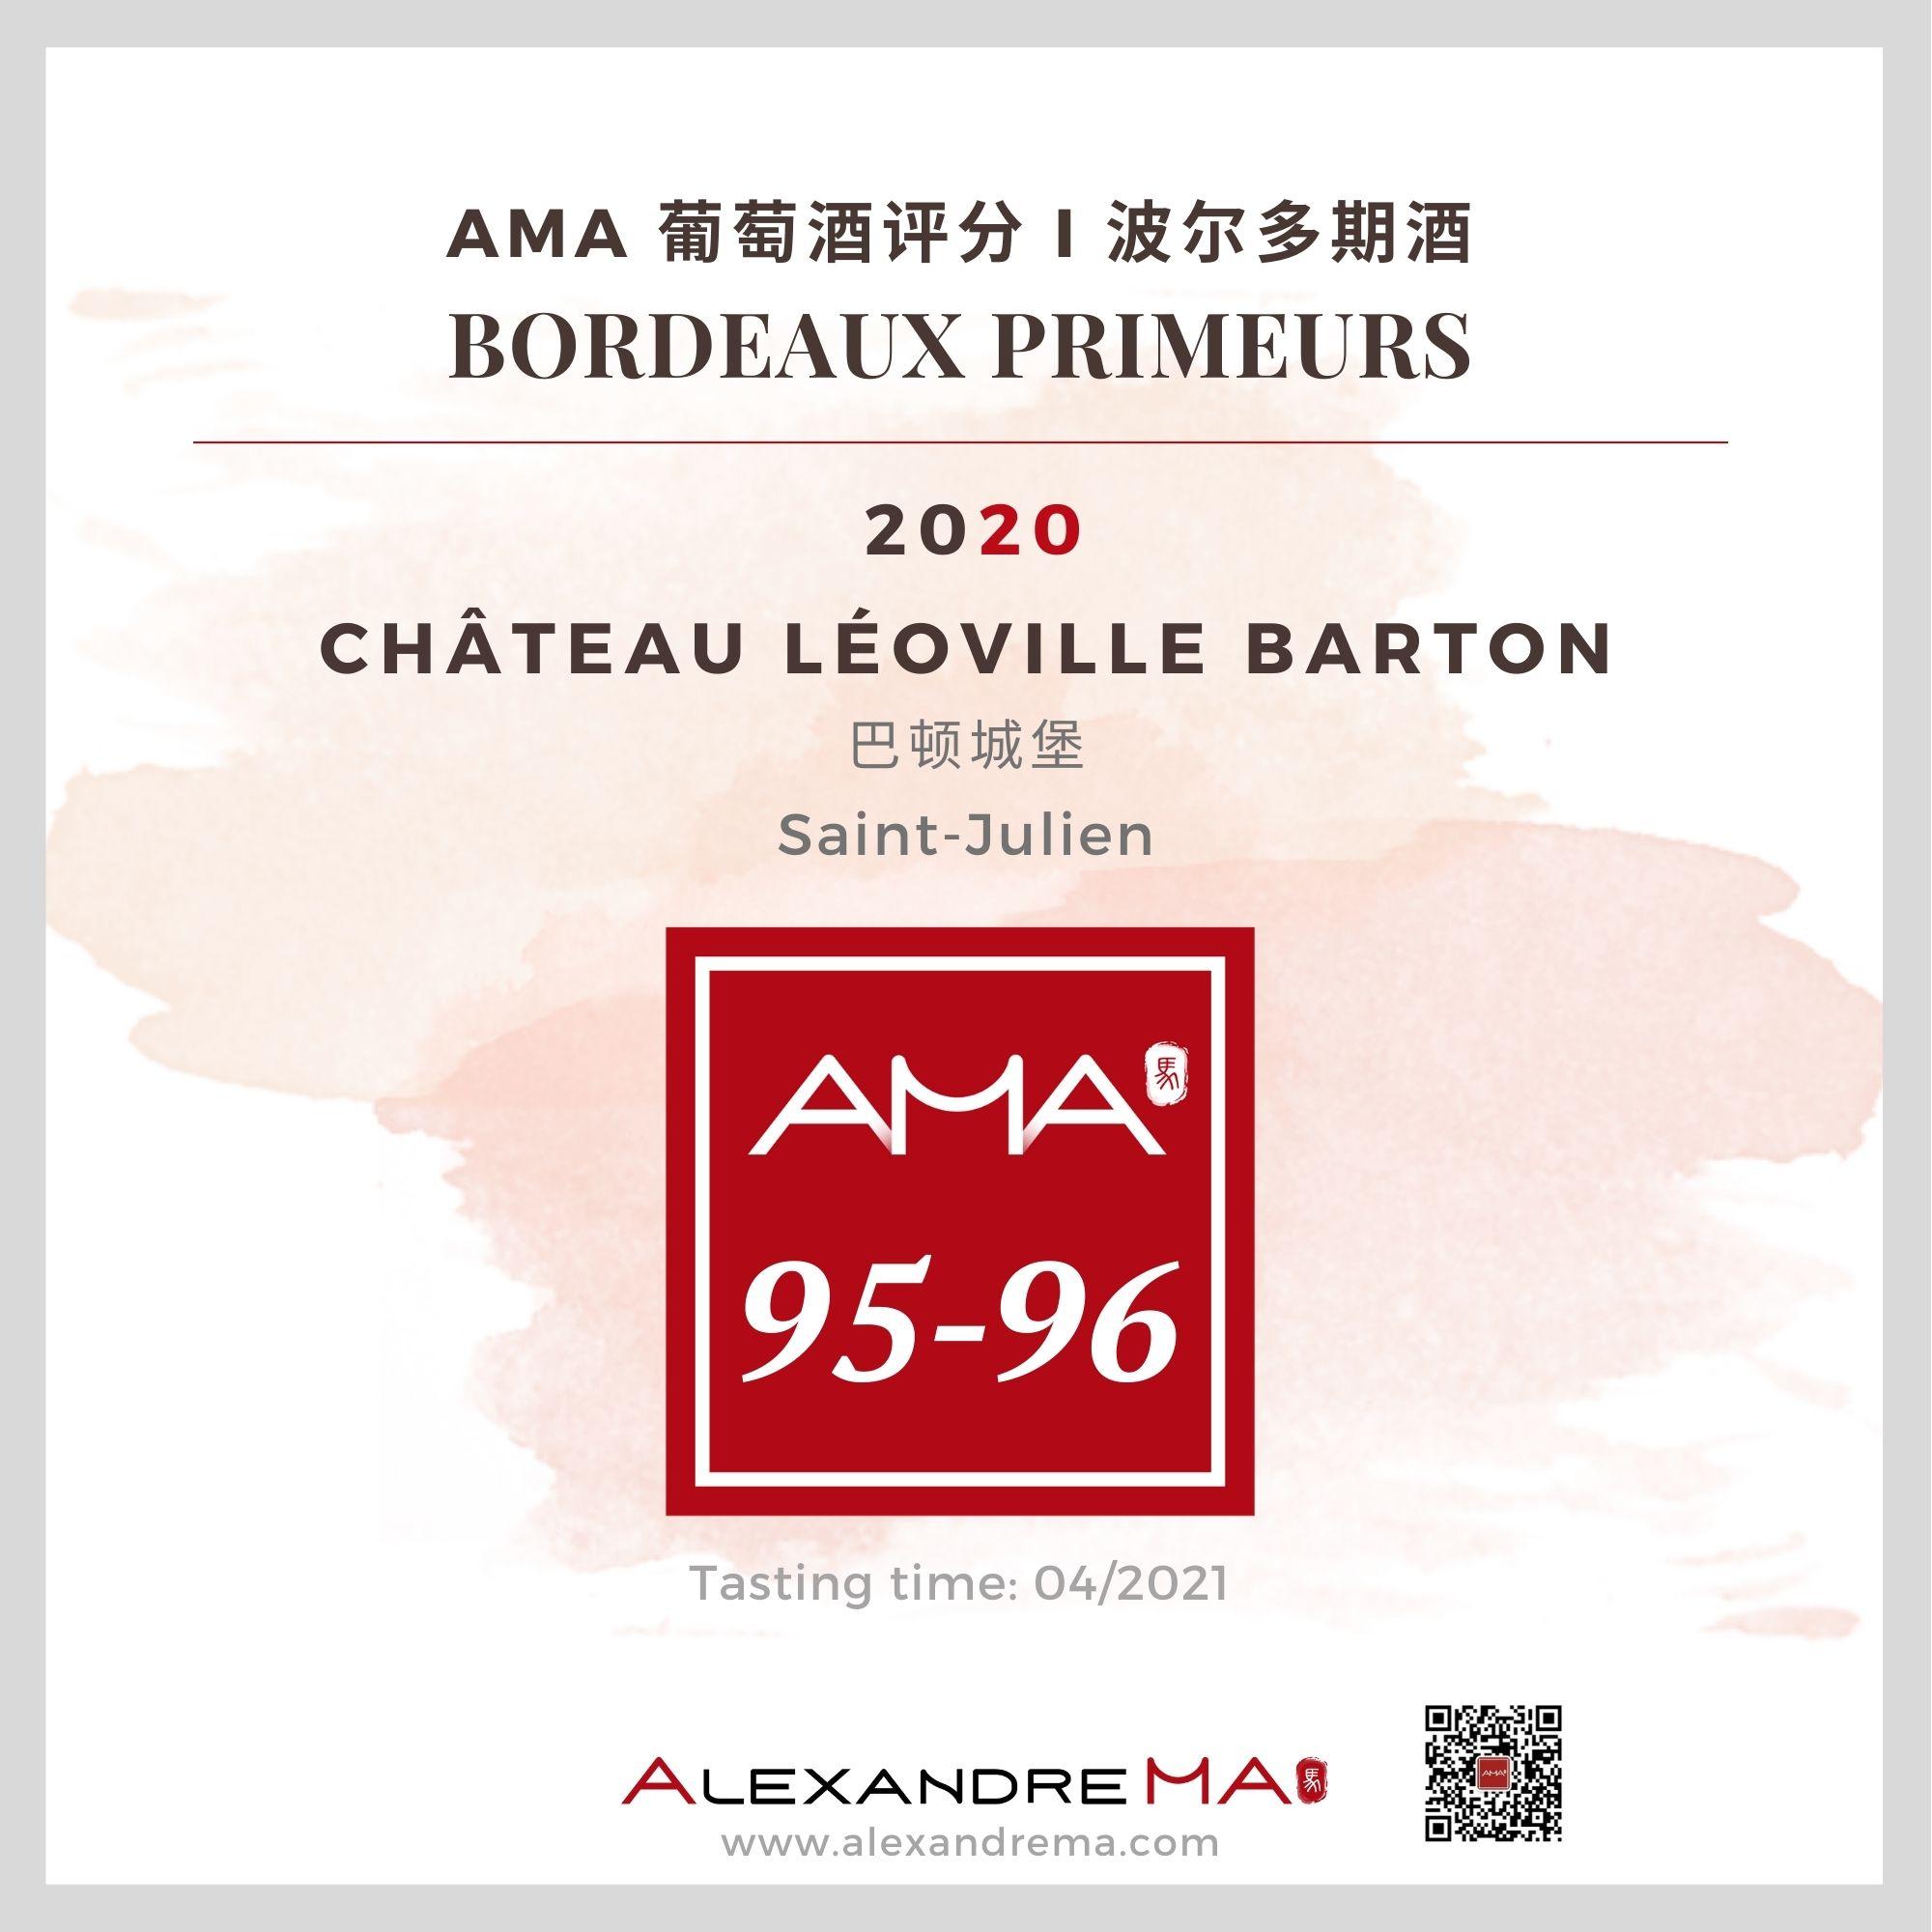 Château Léoville Barton 2020 - Alexandre MA